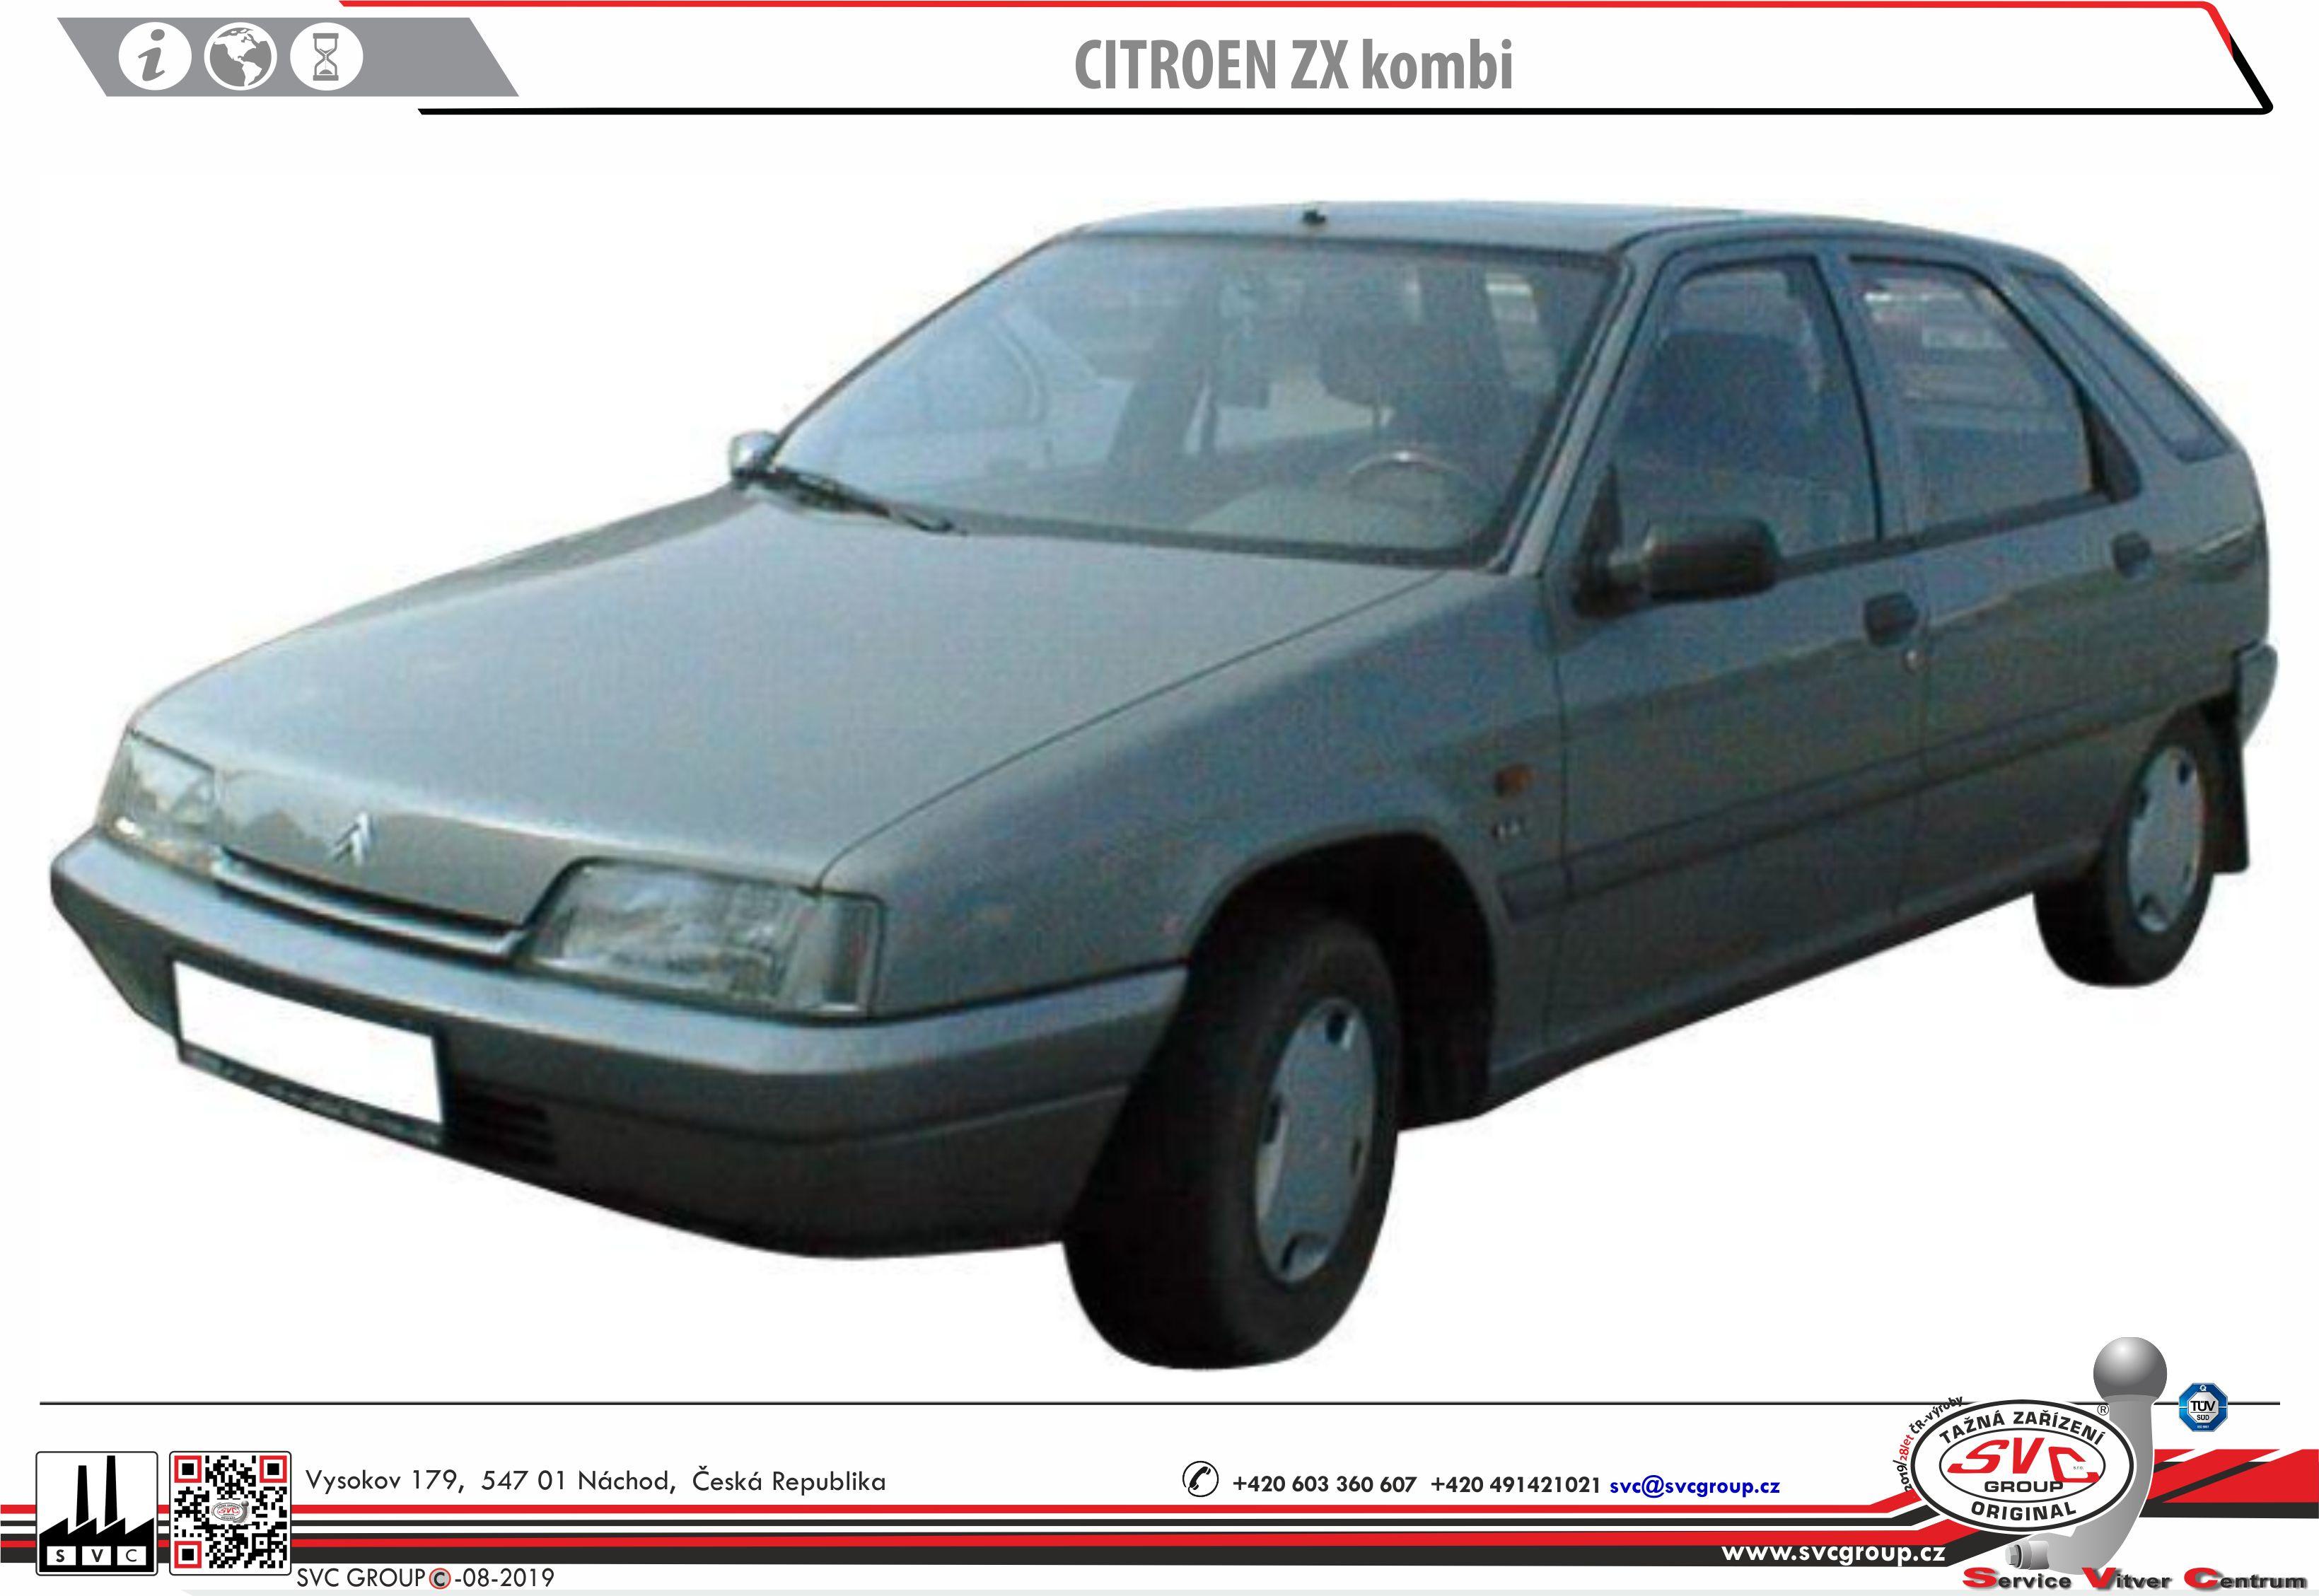 Citroën ZX Kombi